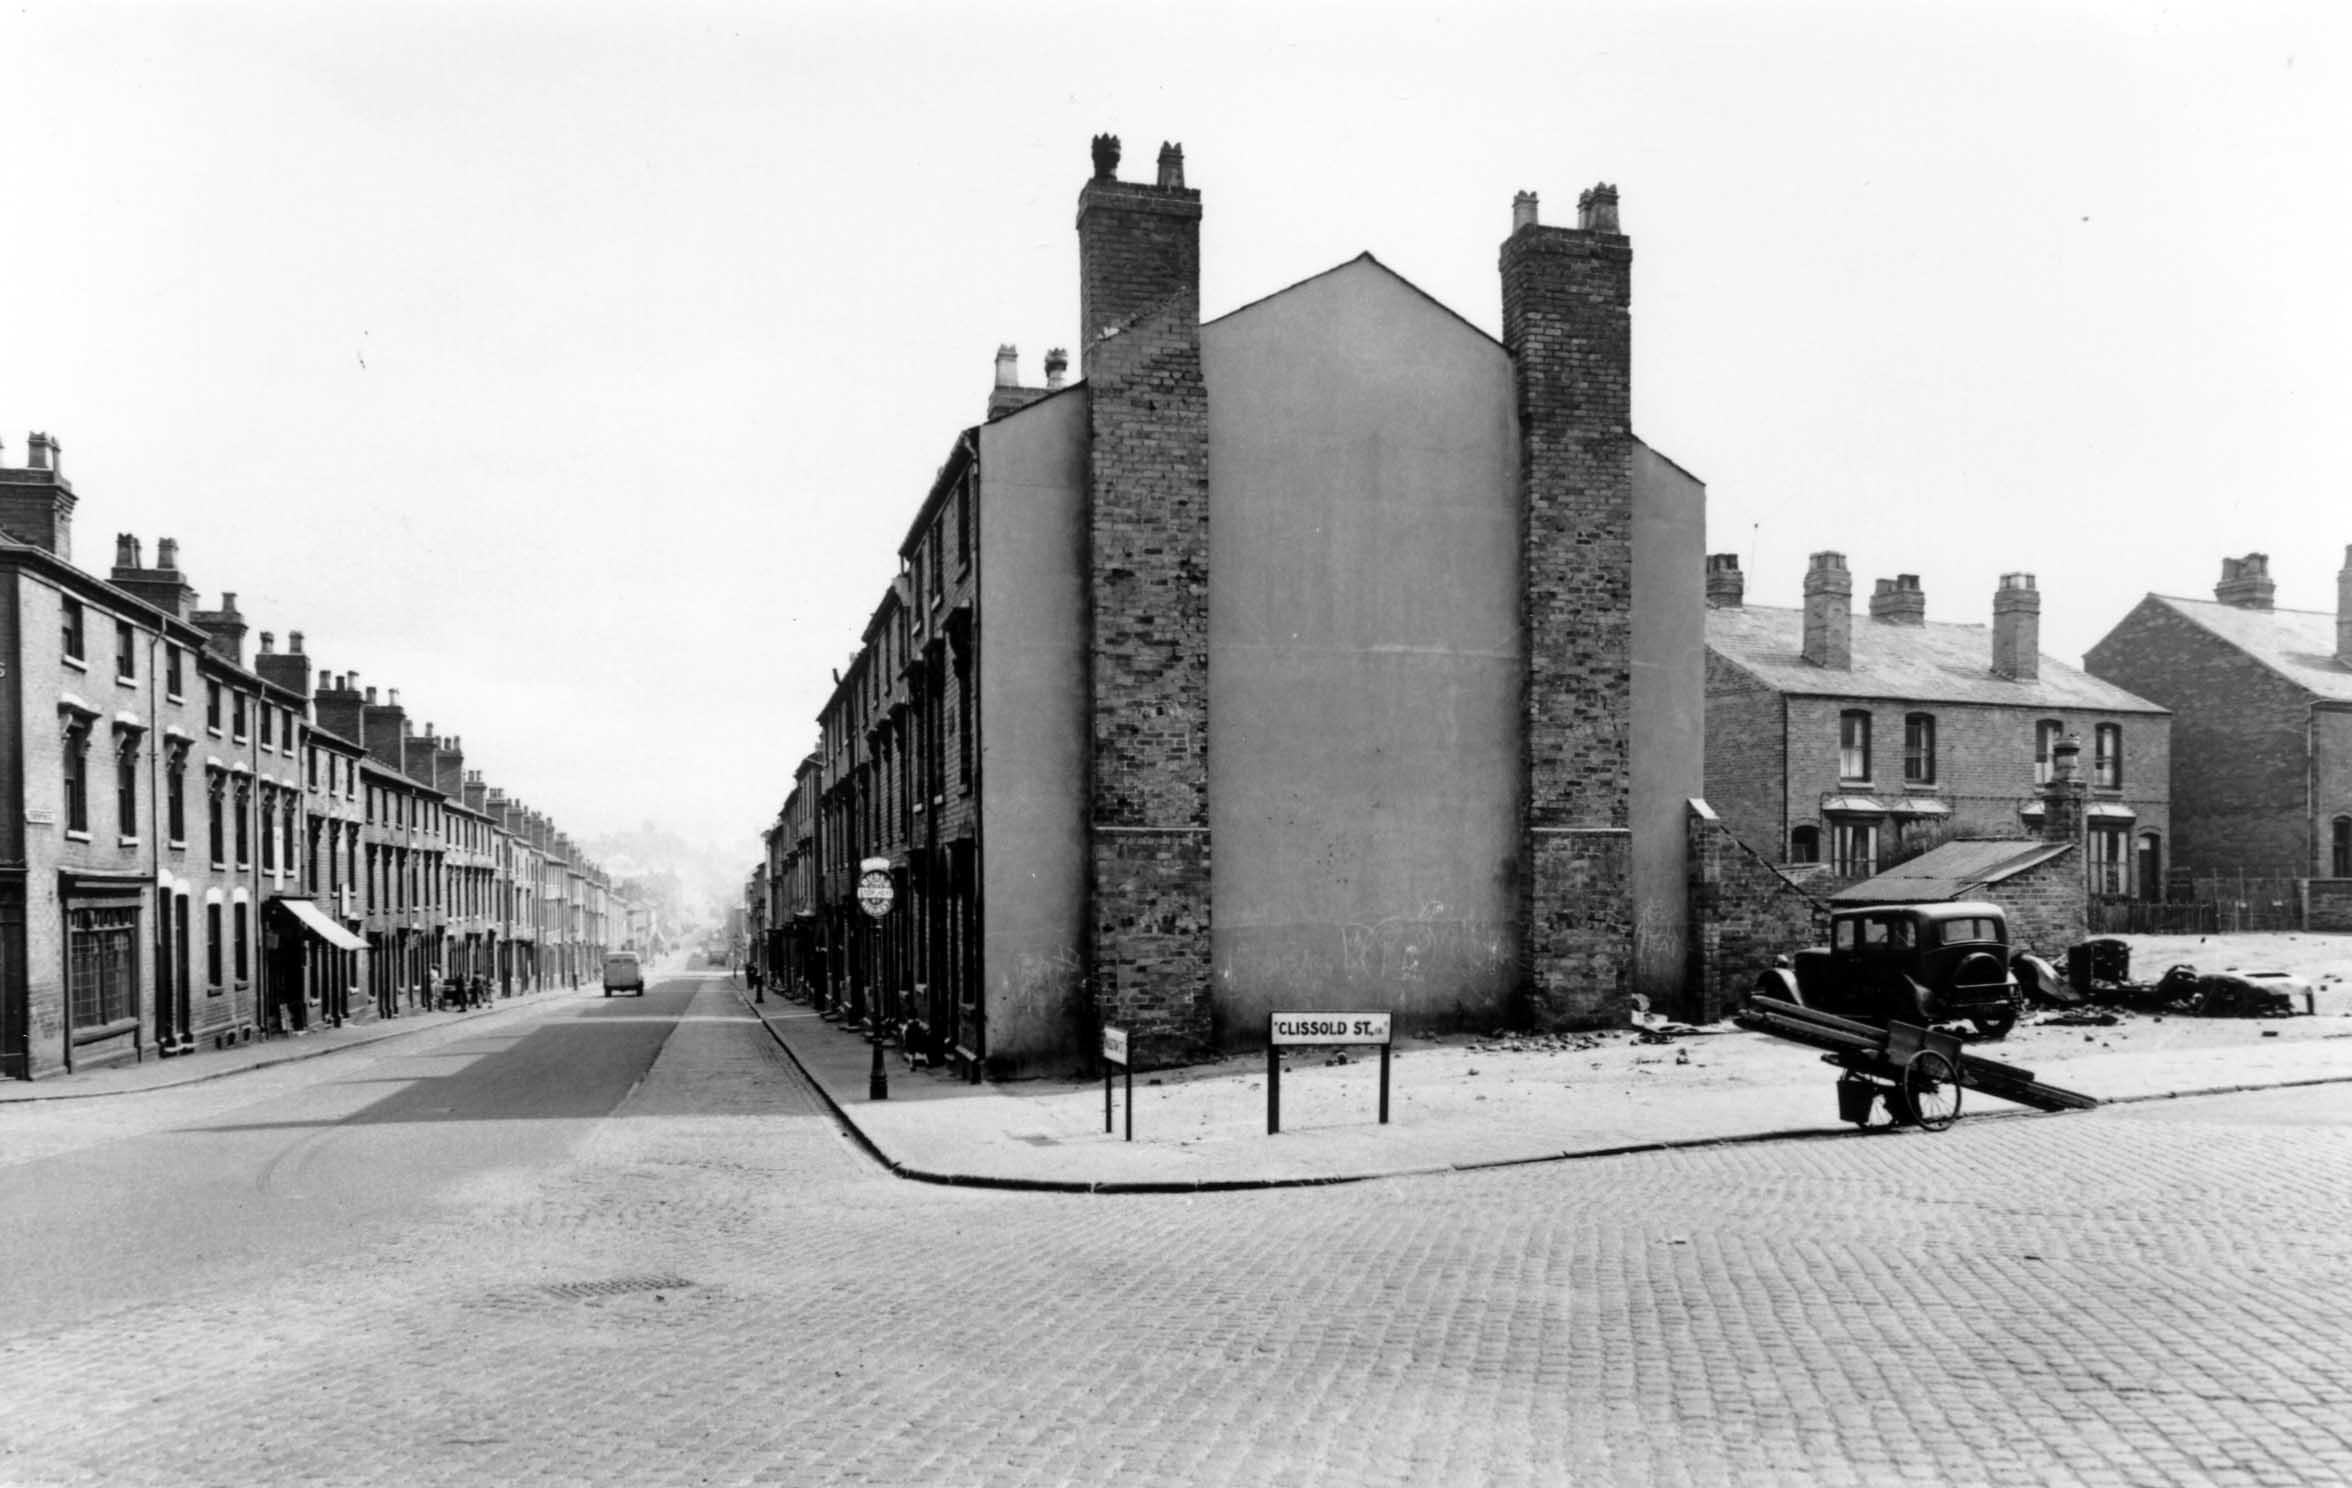 22 Clissold Street - Hingeston Street Brookfields 30-5-1956.jpg